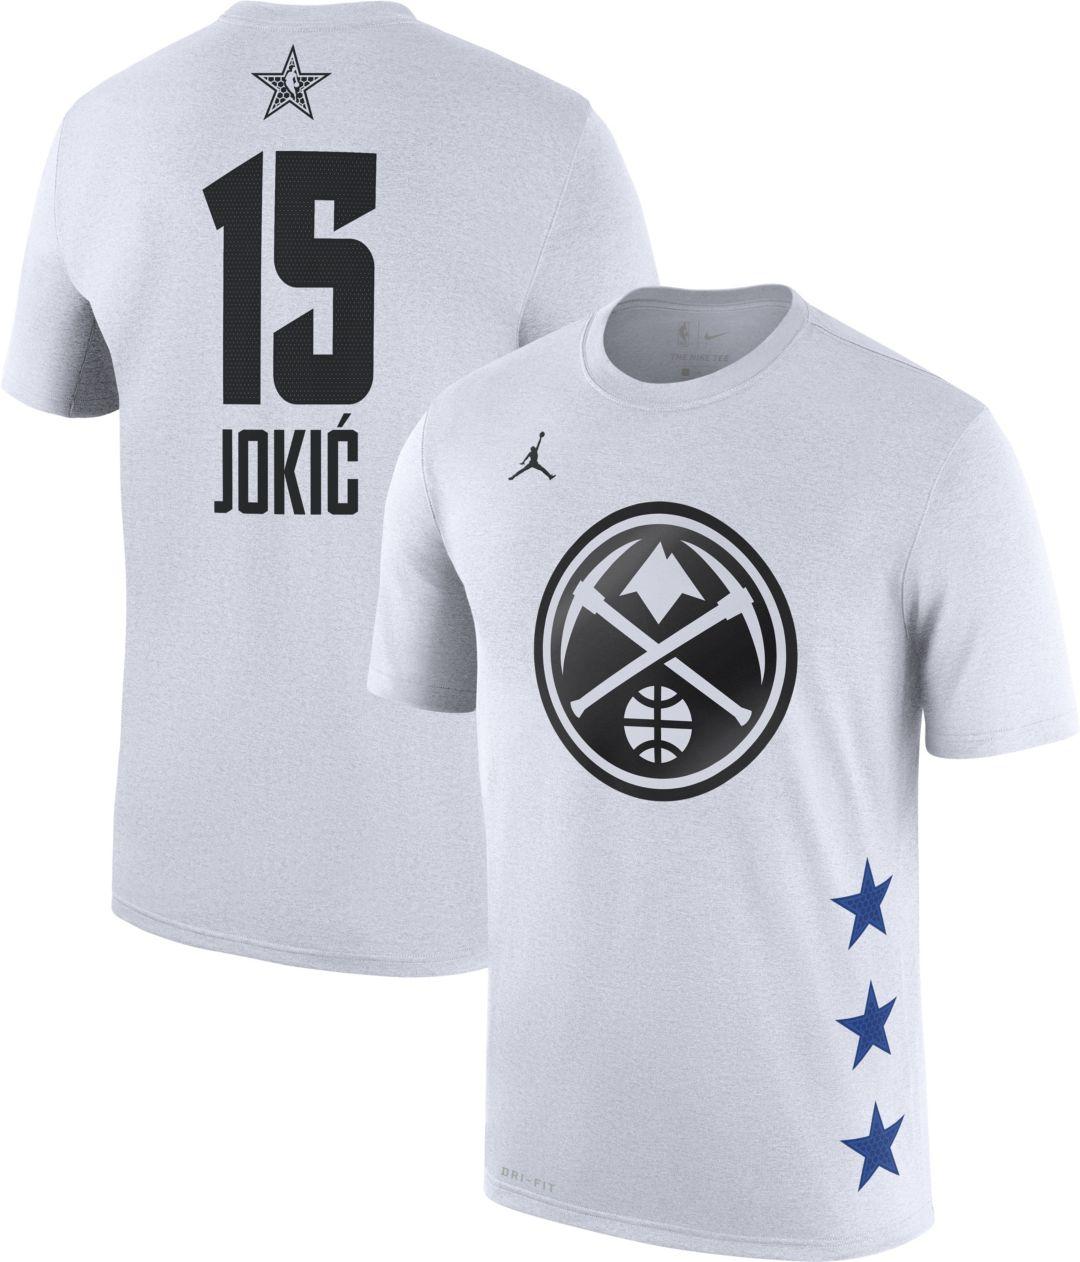 77f566c0013 Jordan Youth 2019 NBA All-Star Game Nikola Jokic Dri-FIT White T ...